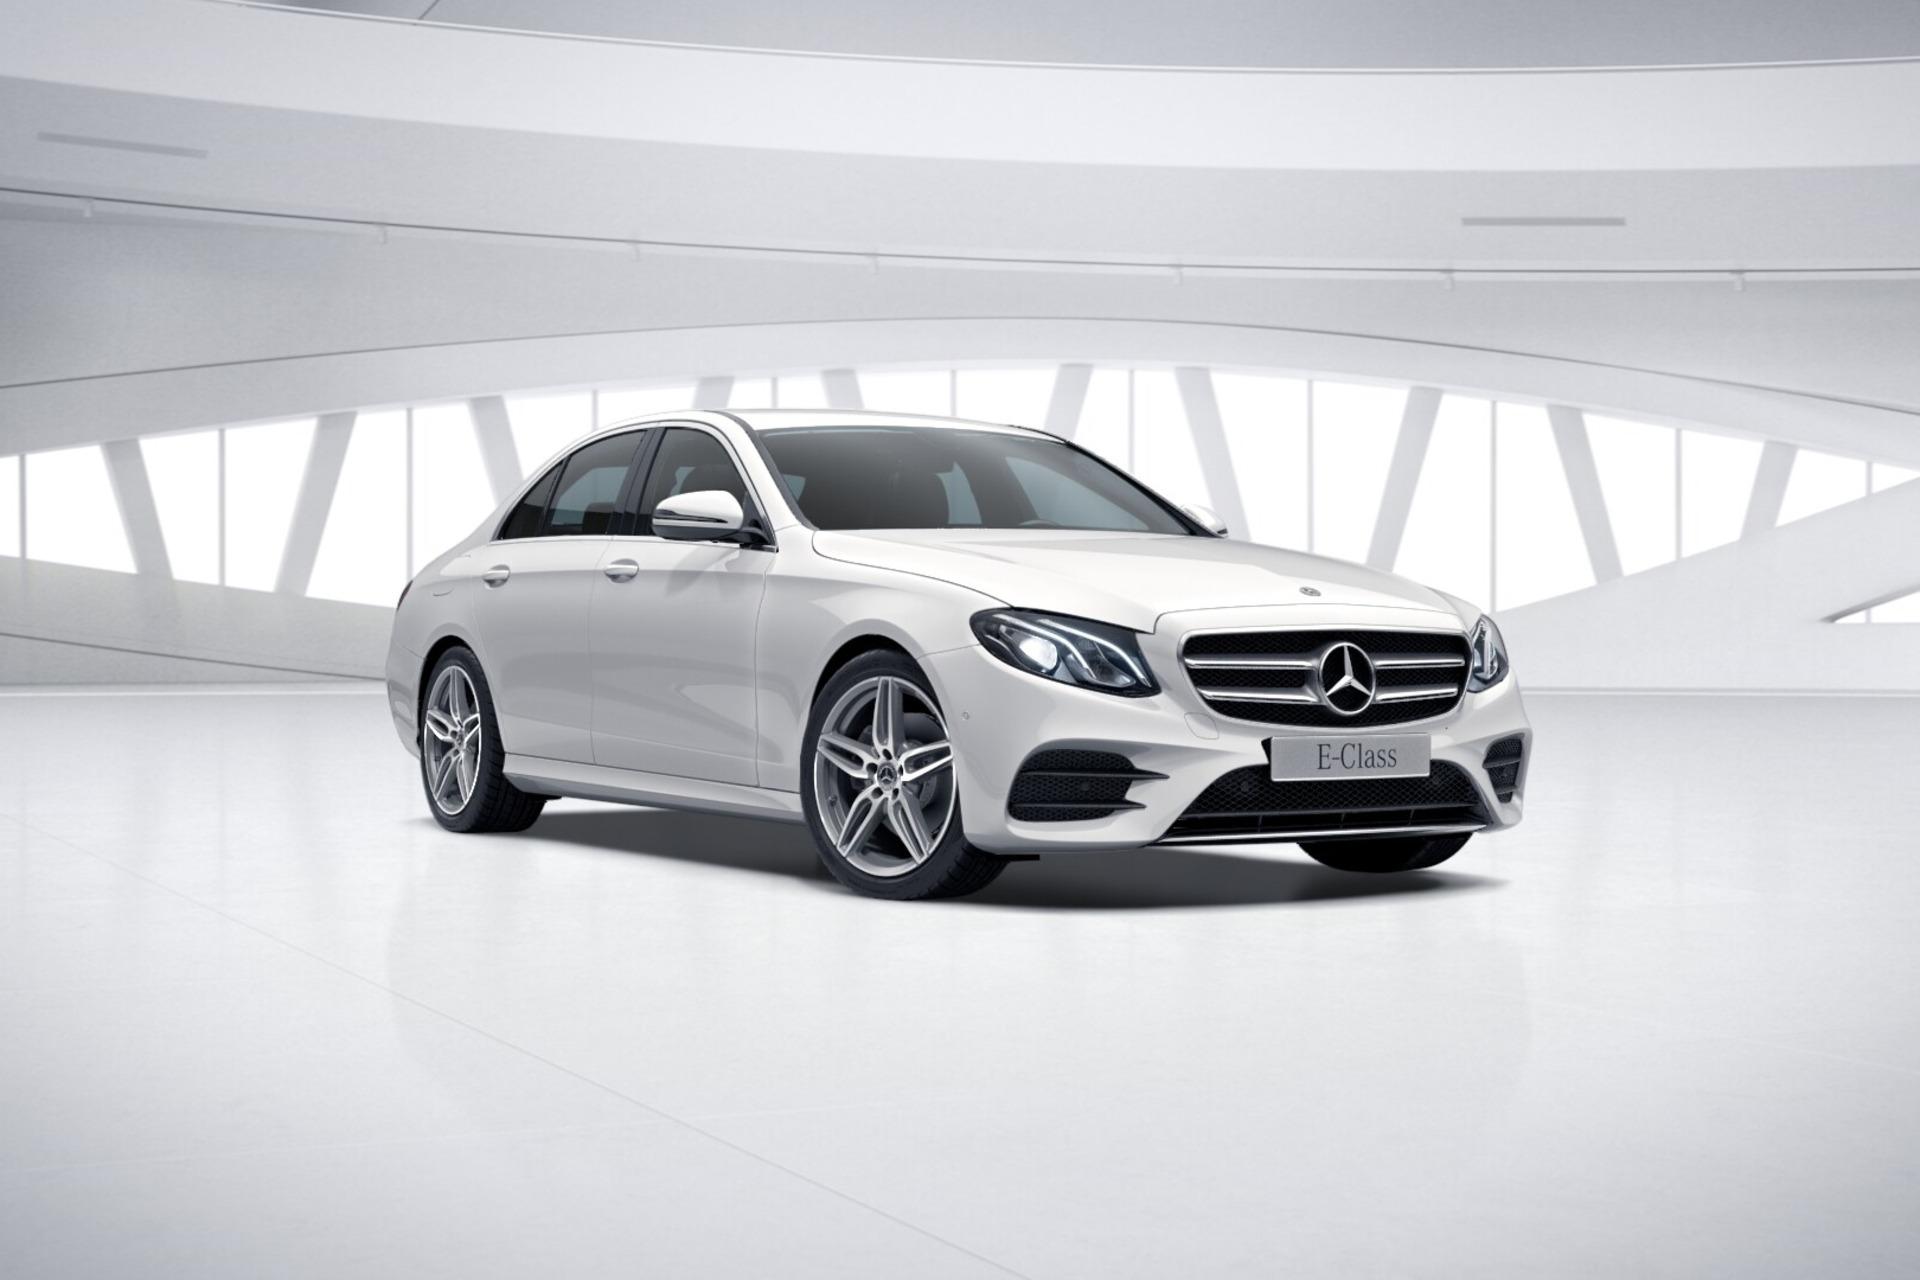 Mercedes-Benz E-Class Limousine 952611384